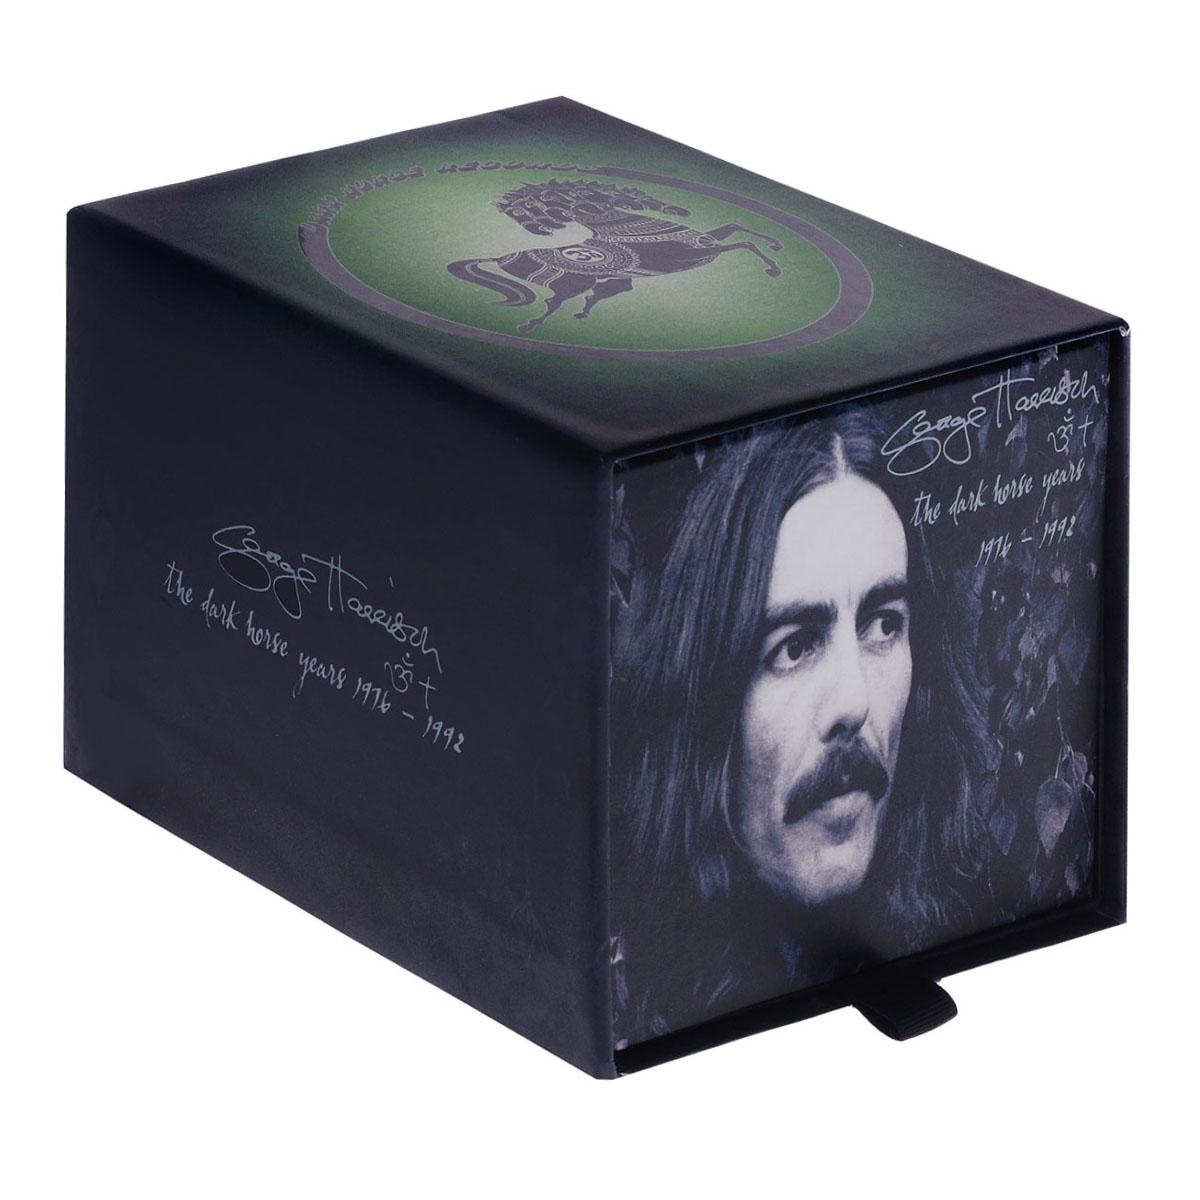 Джордж Харрисон George Harrison. The Dark Horse Years 1976-1992 (5 CD + 2 SACD + DVD) джордж харрисон george harrison electronic sound